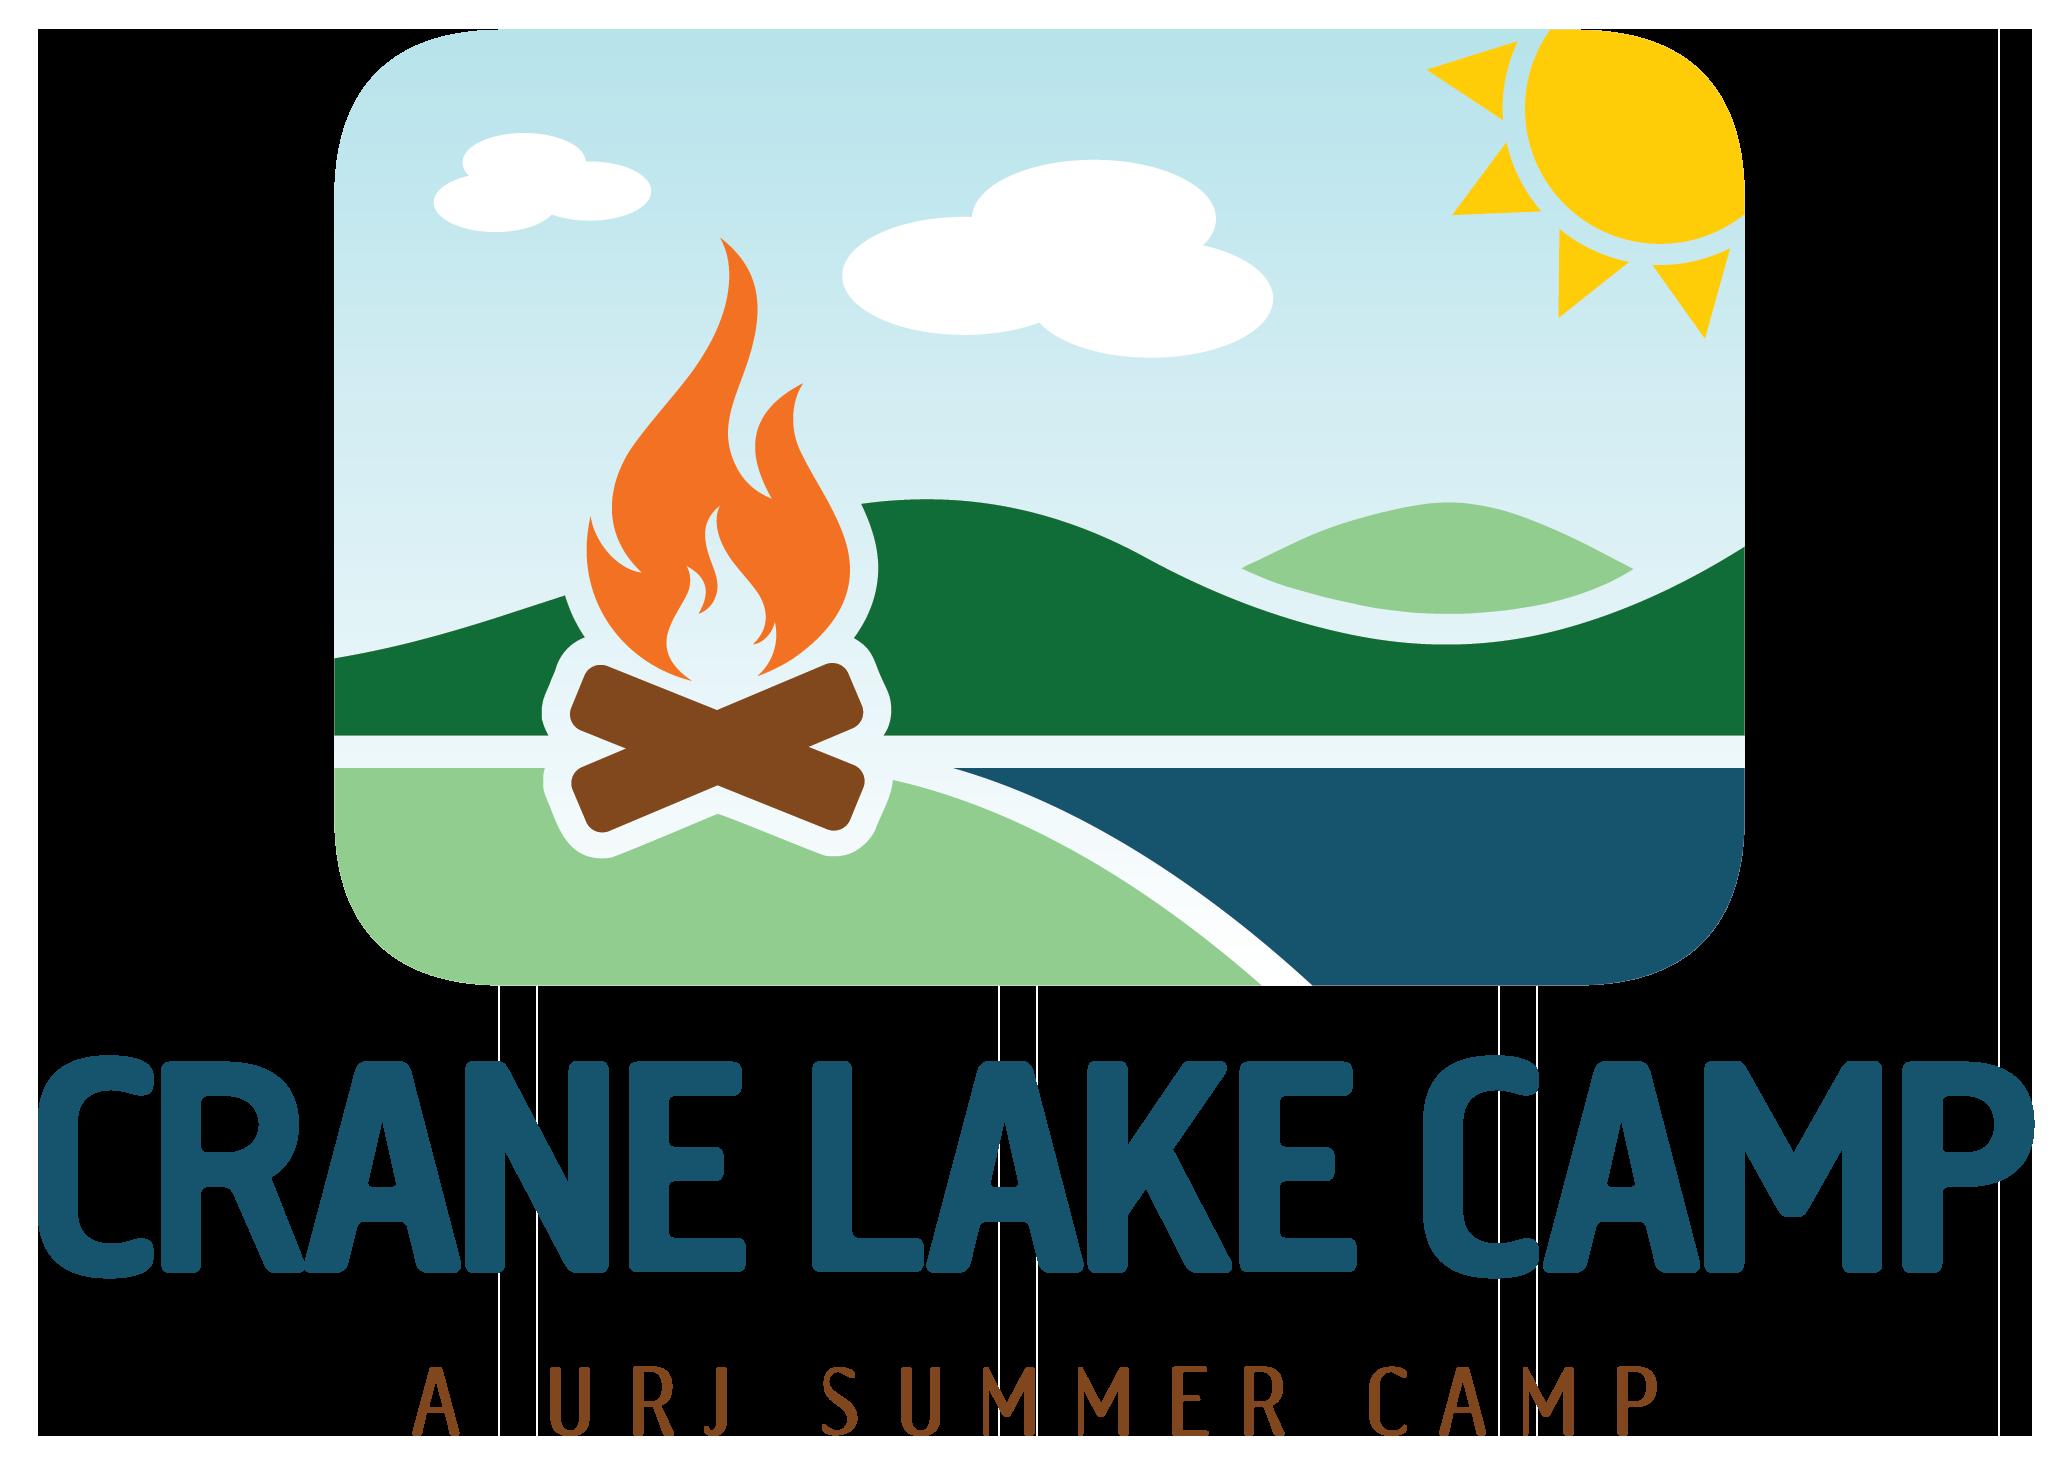 URJ Crane Lake Camp